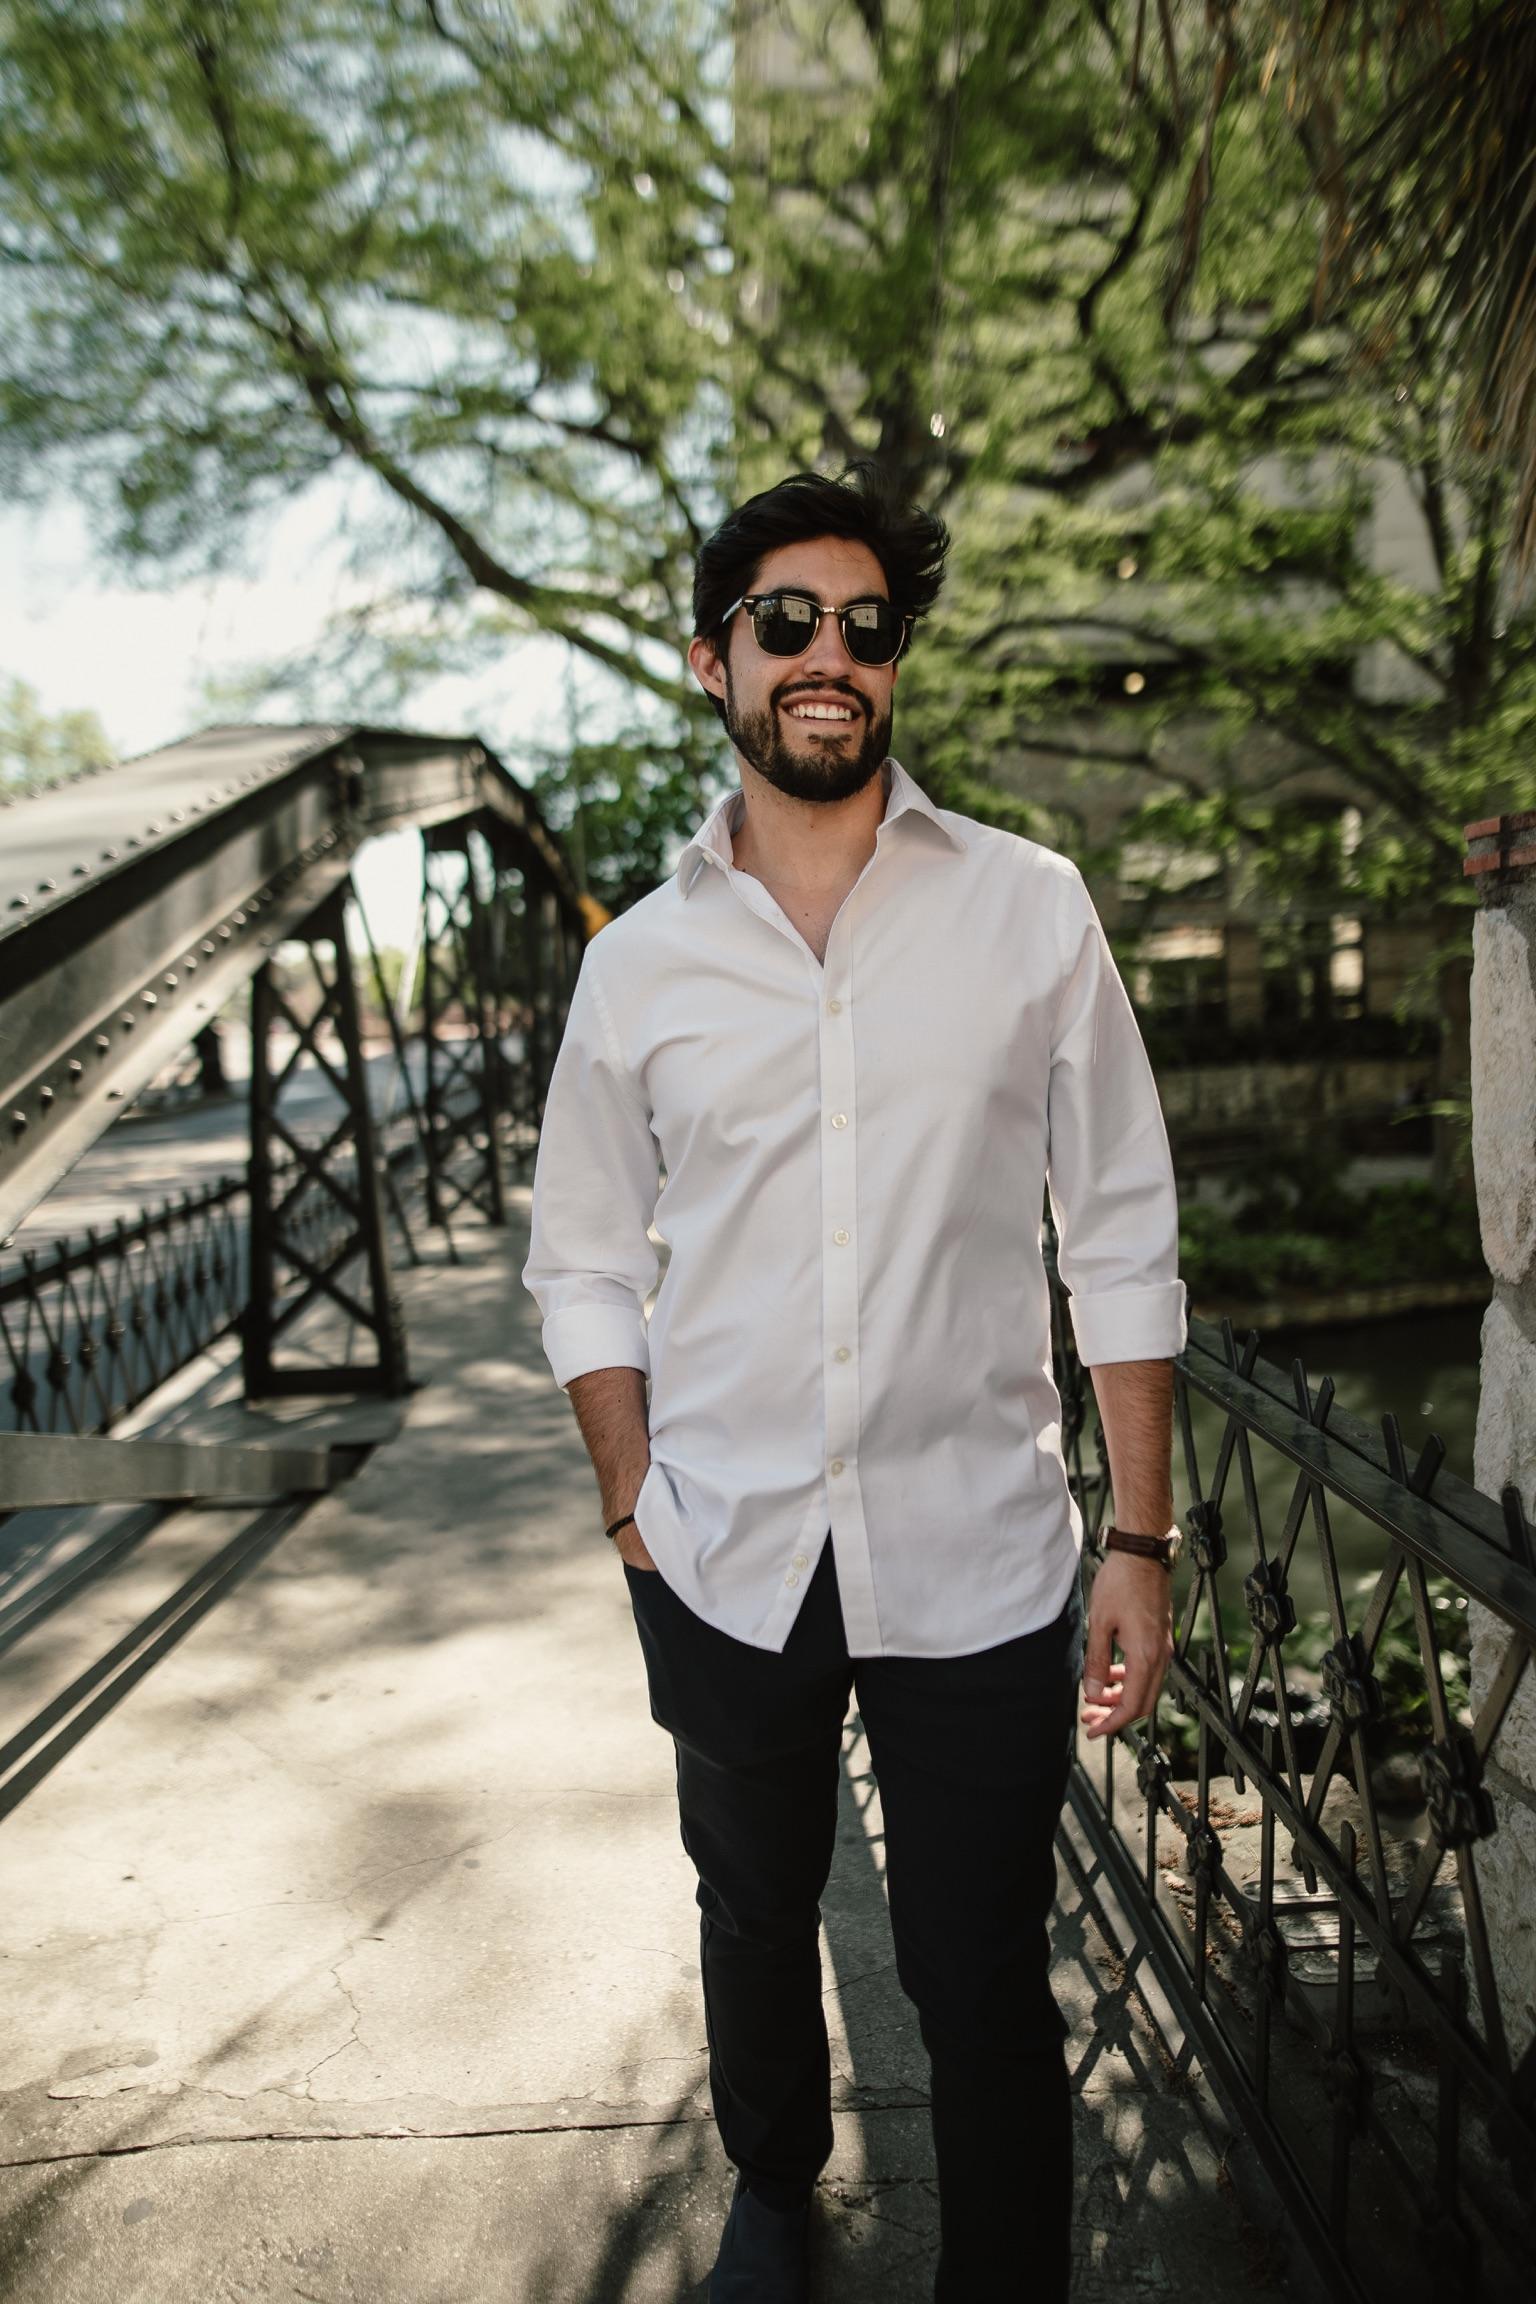 Diego A. Fernandez Co-Founder, Business Developer